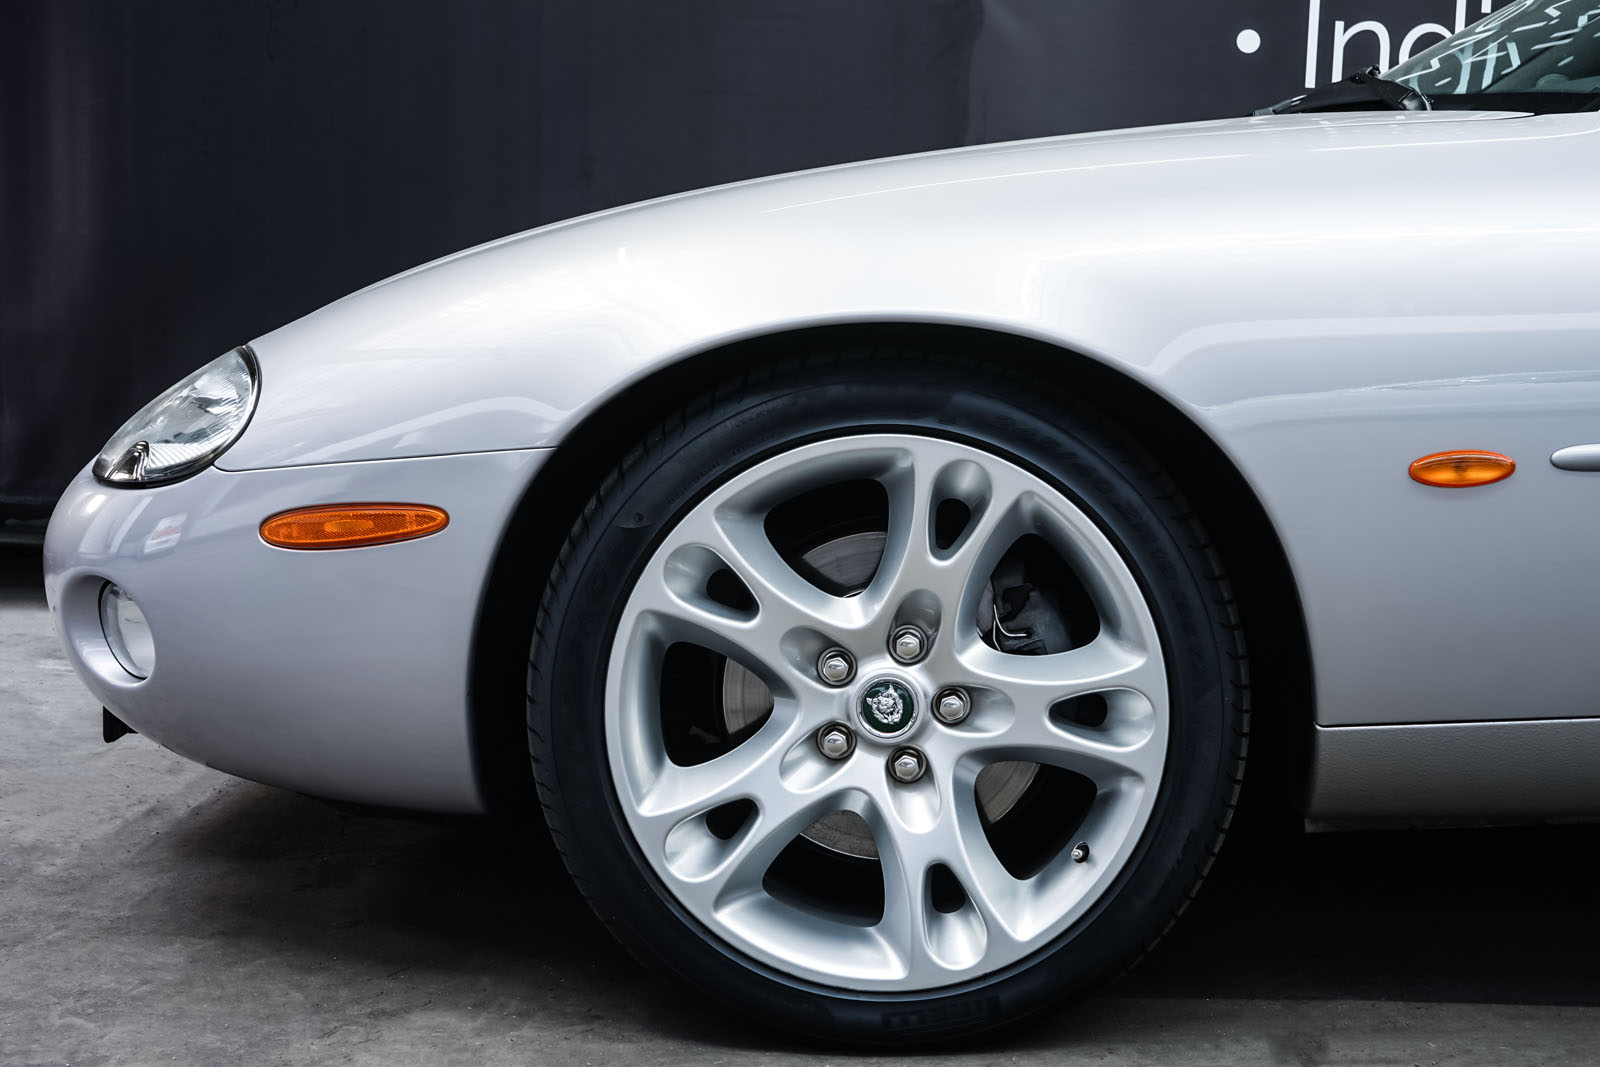 Jaguar_XK8_4.0_Silber_Schwarz_JAG-9731_3_w